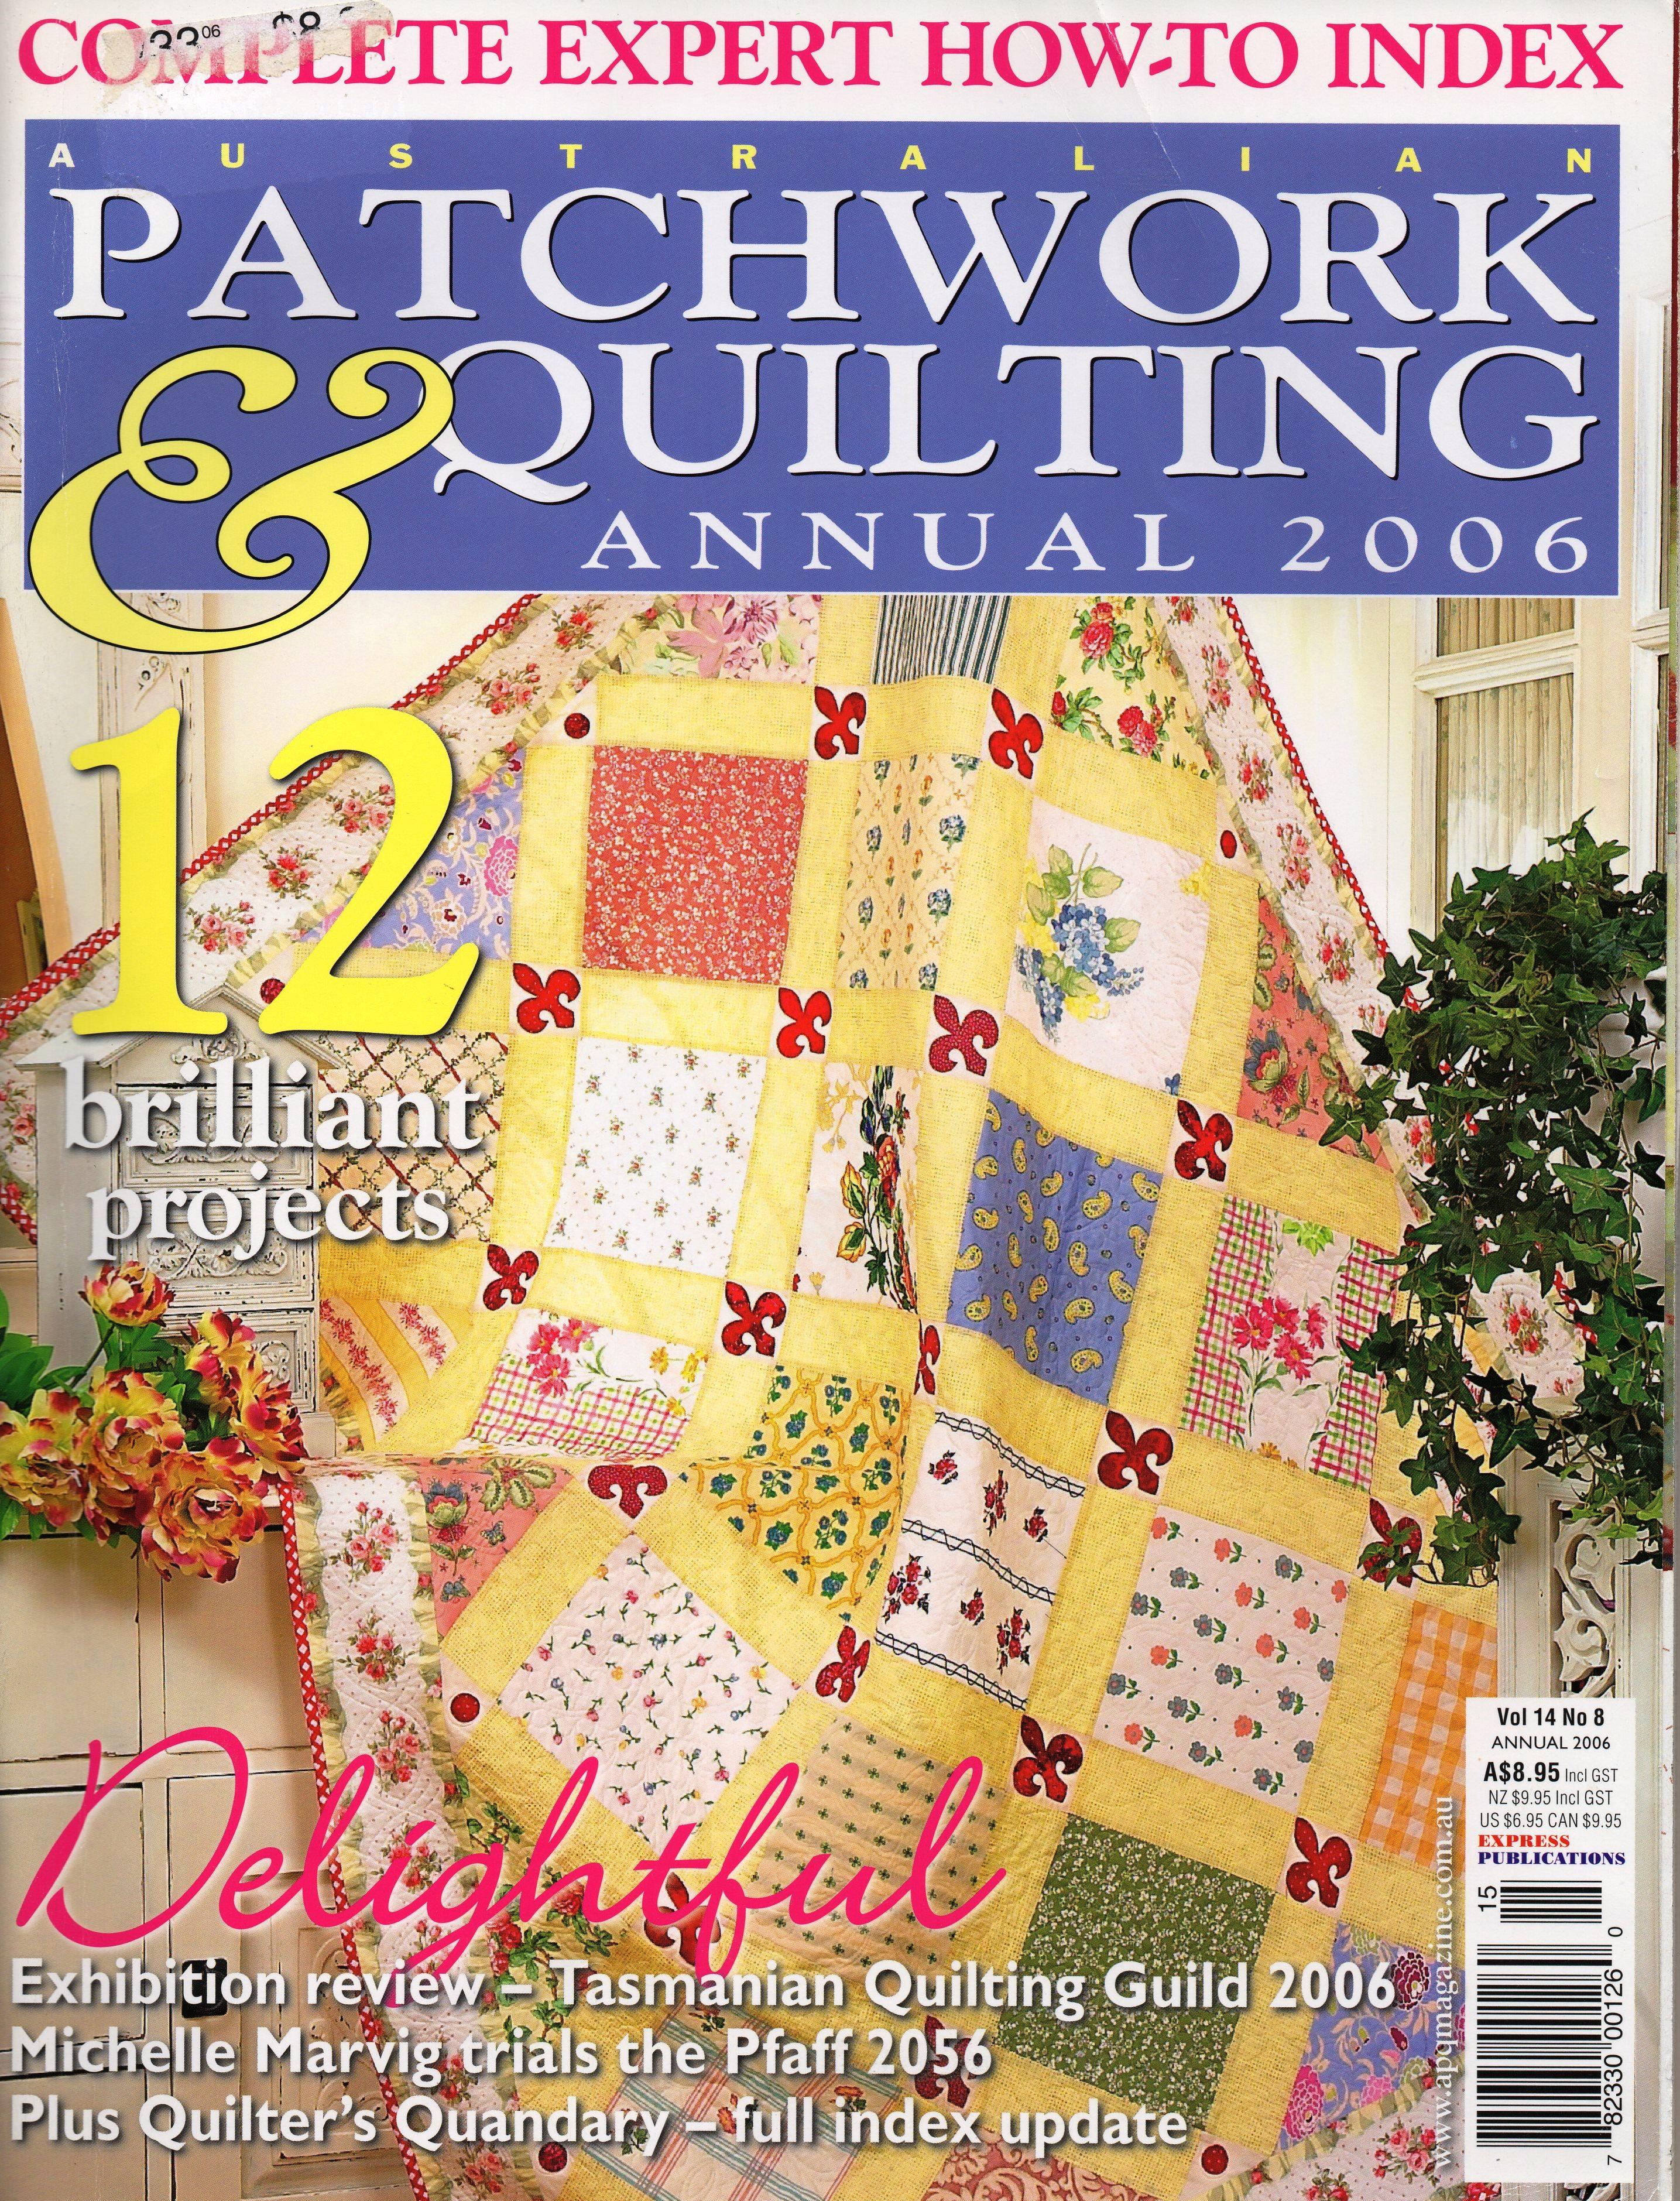 Aust. Patchwork & Quilting 2006